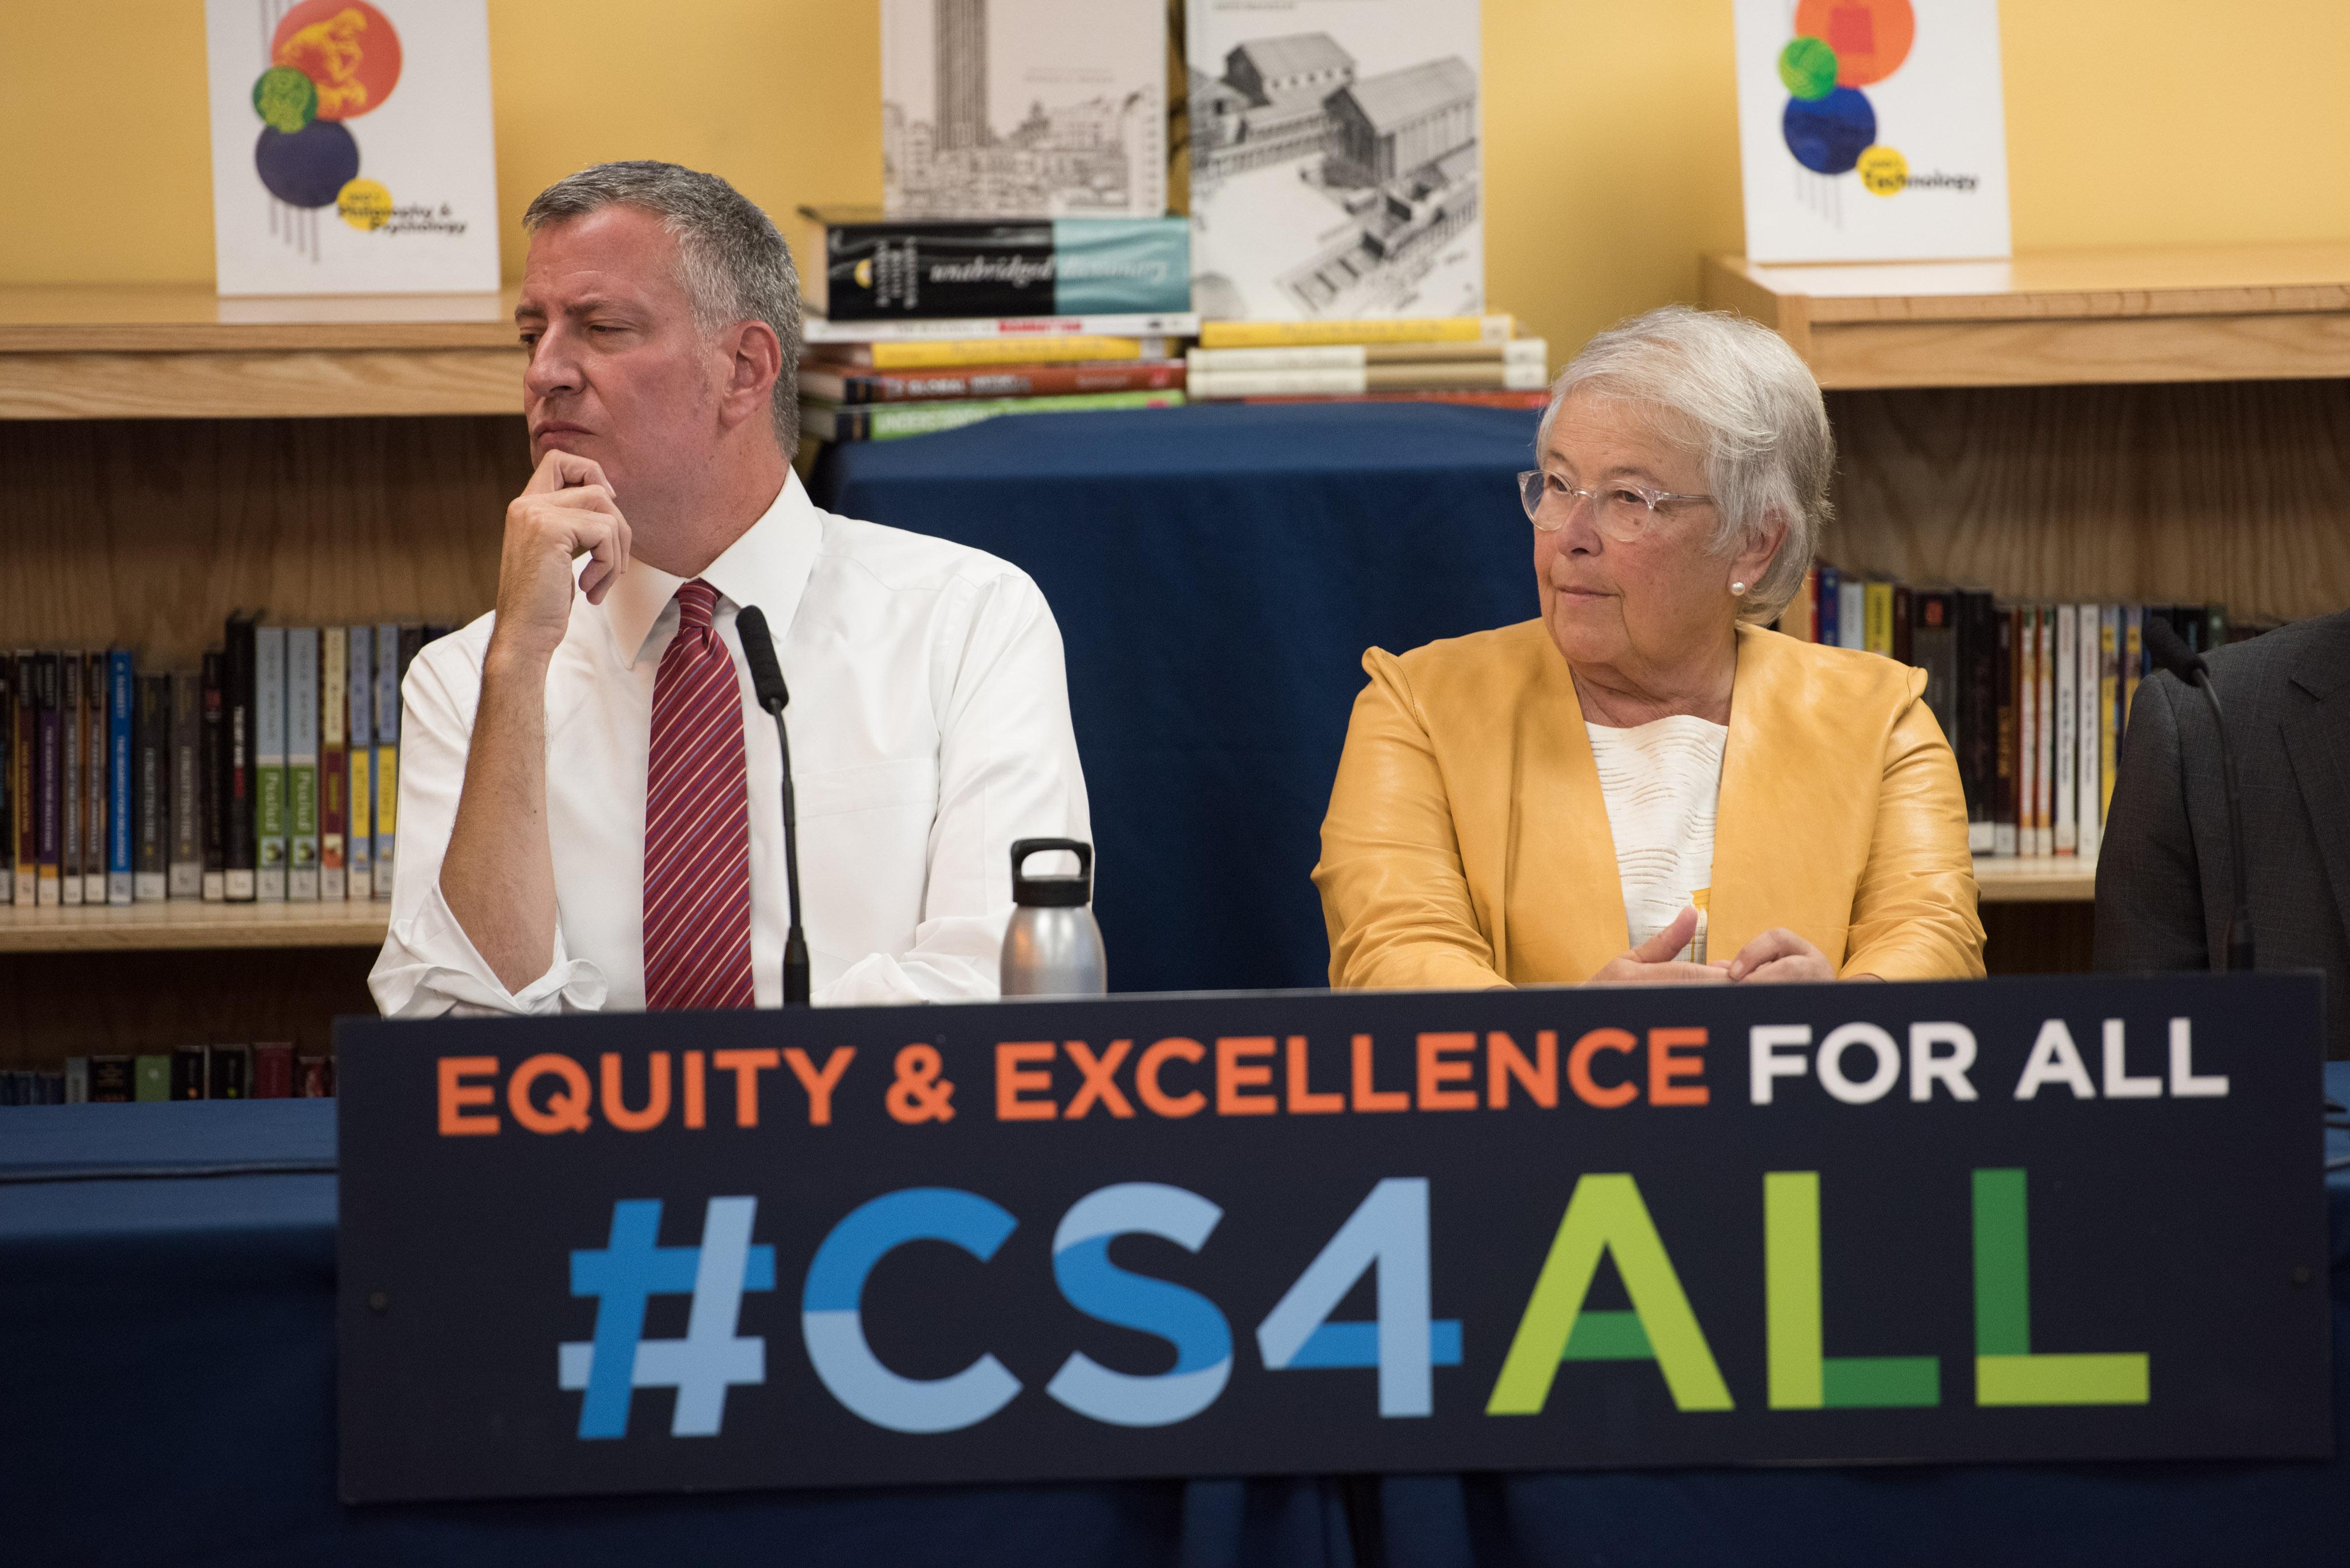 Mayor Bill de Blasio and Schools Chancellor Carmen Fariña in the Bronx today.